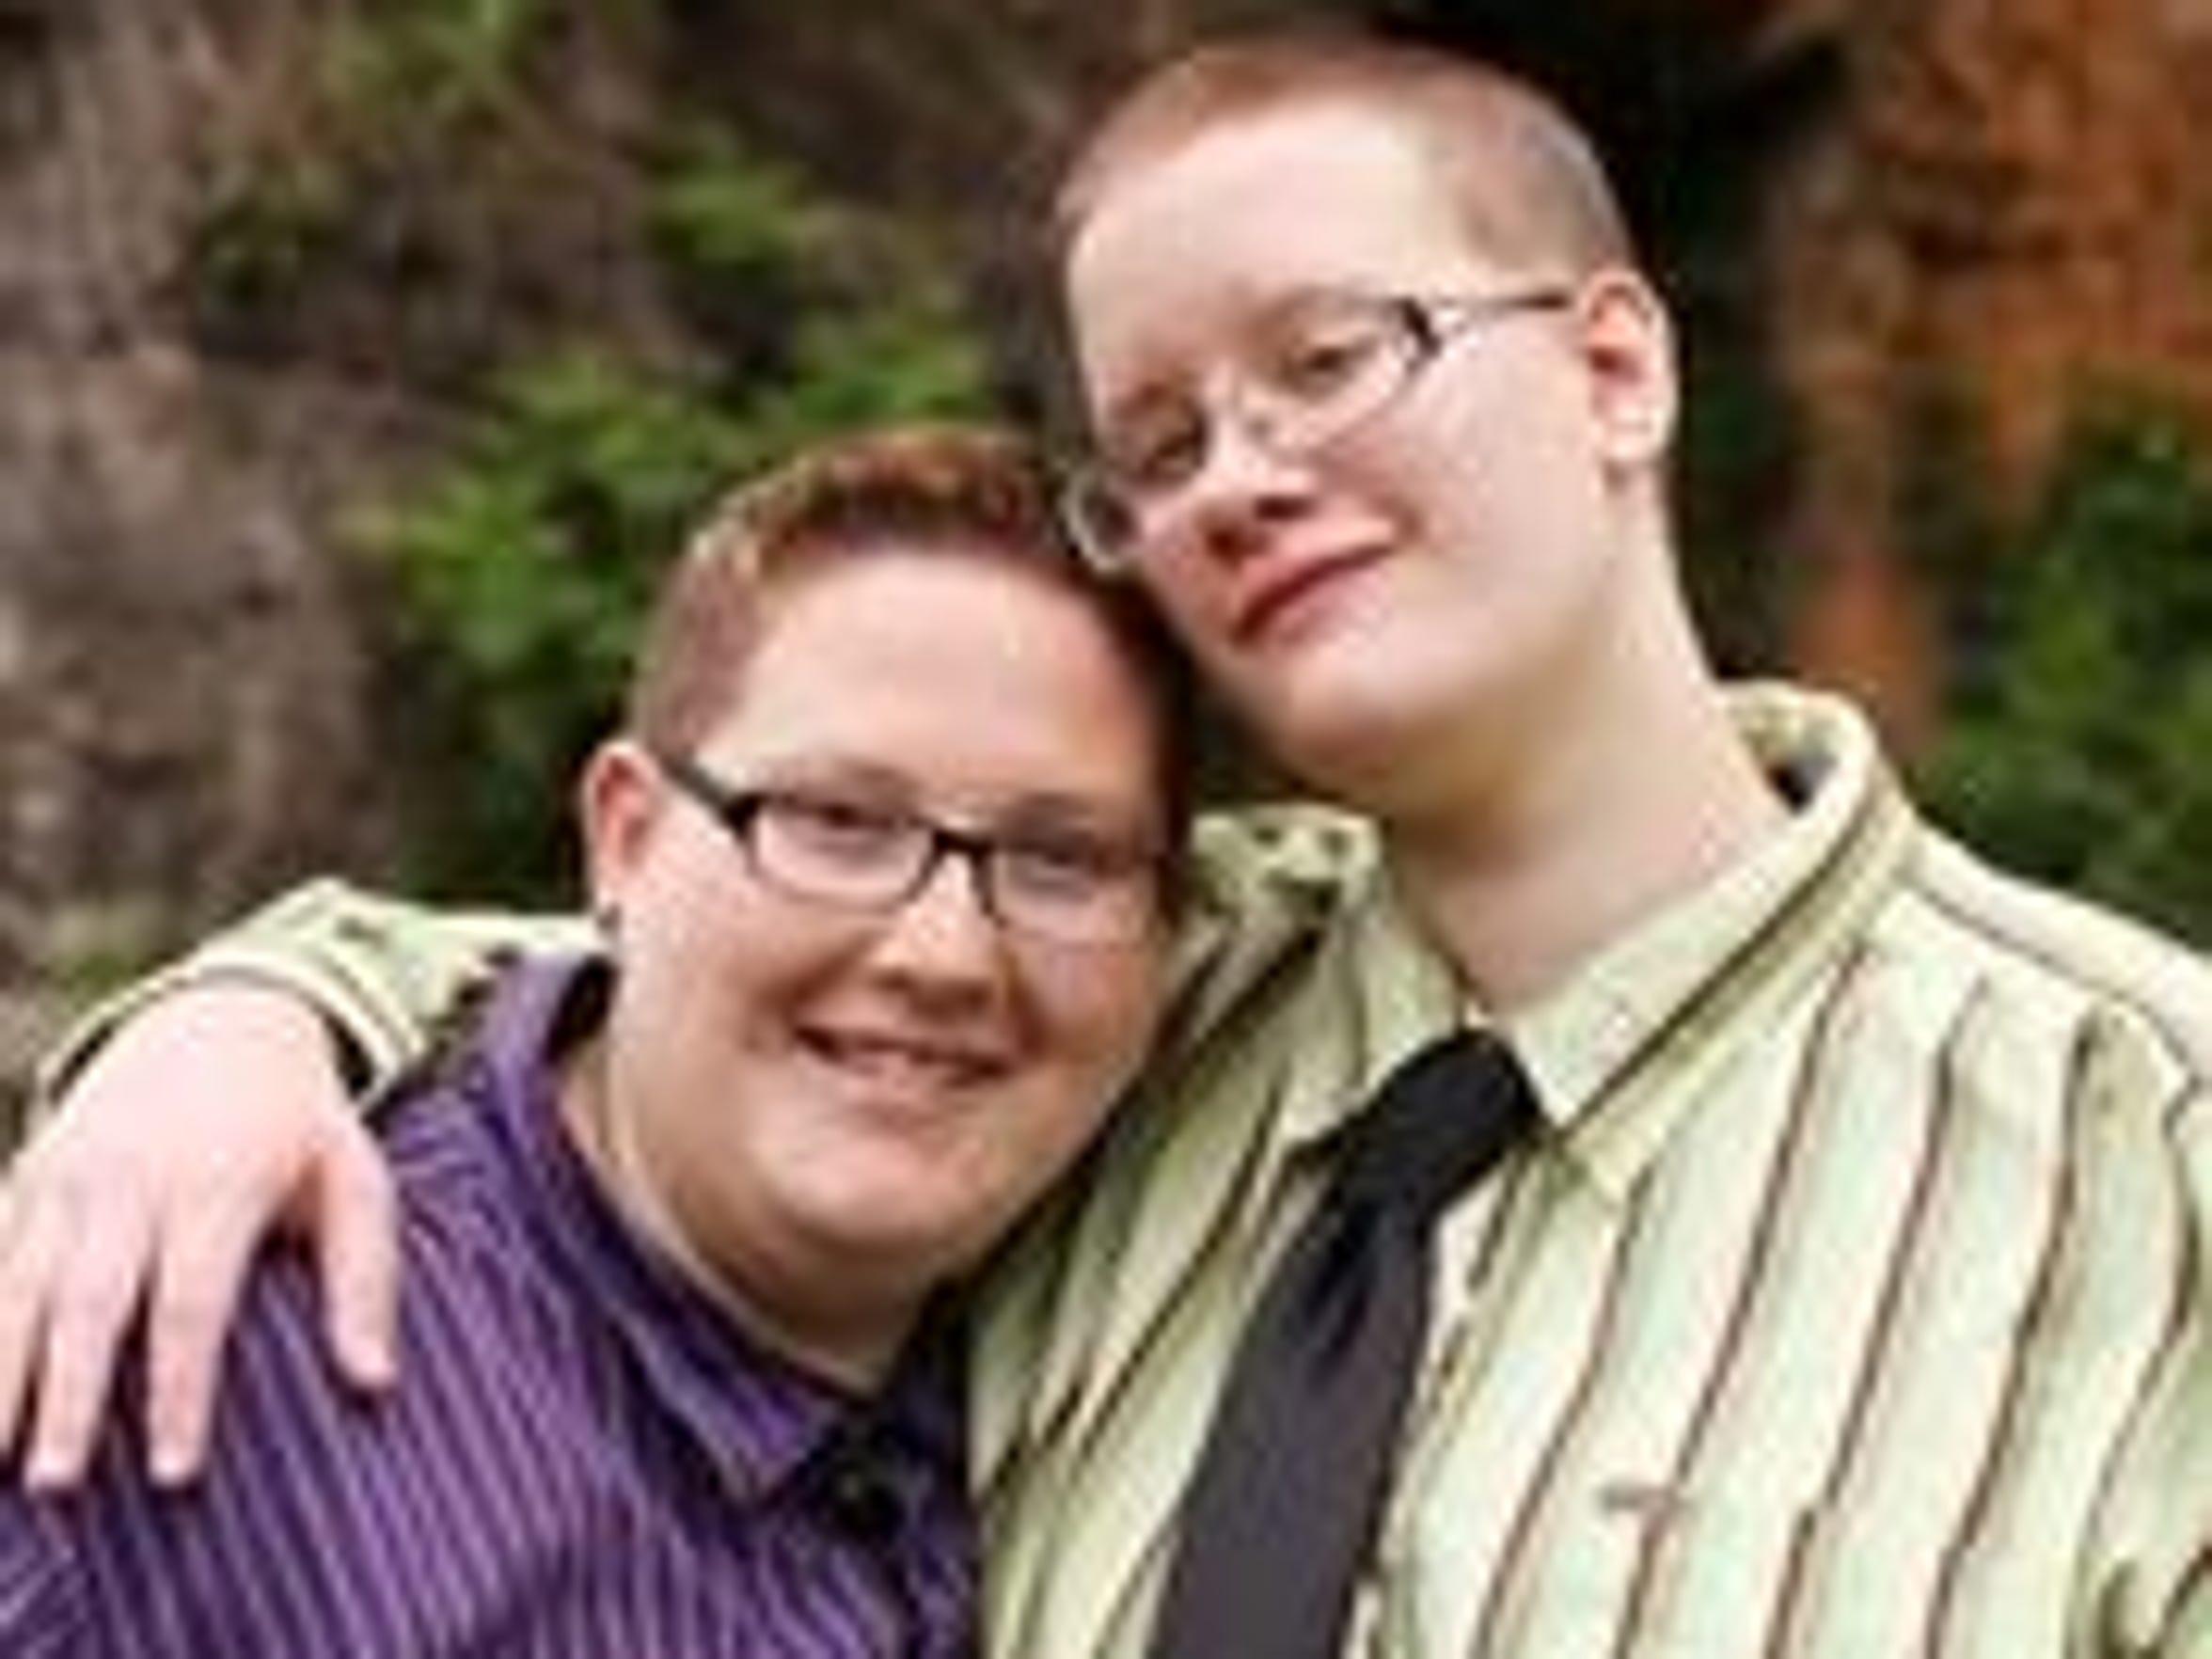 Sami and Ashlye Schwartz on their wedding day in Natural Chimneys Regional Park.